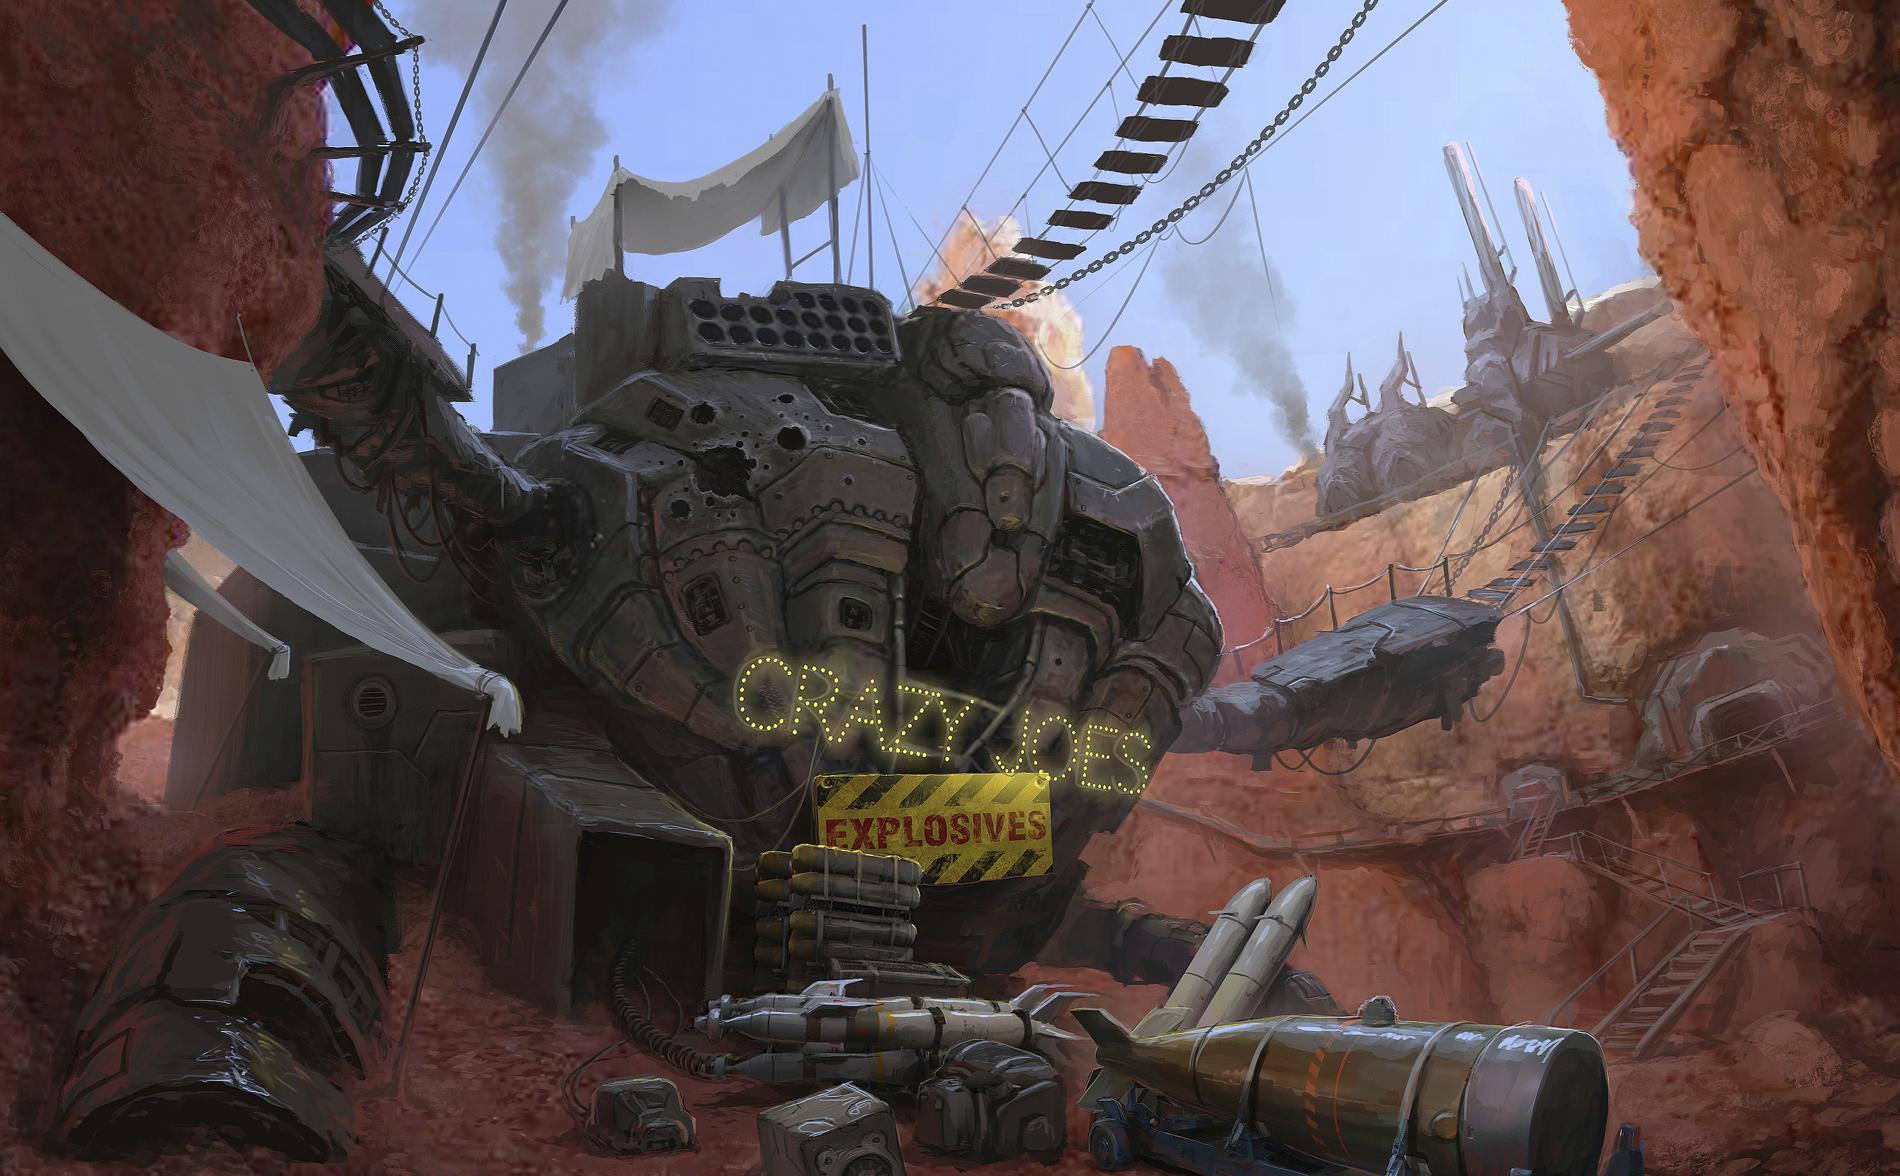 Crazy Joe's Explosives  | Art by Filip Dudek